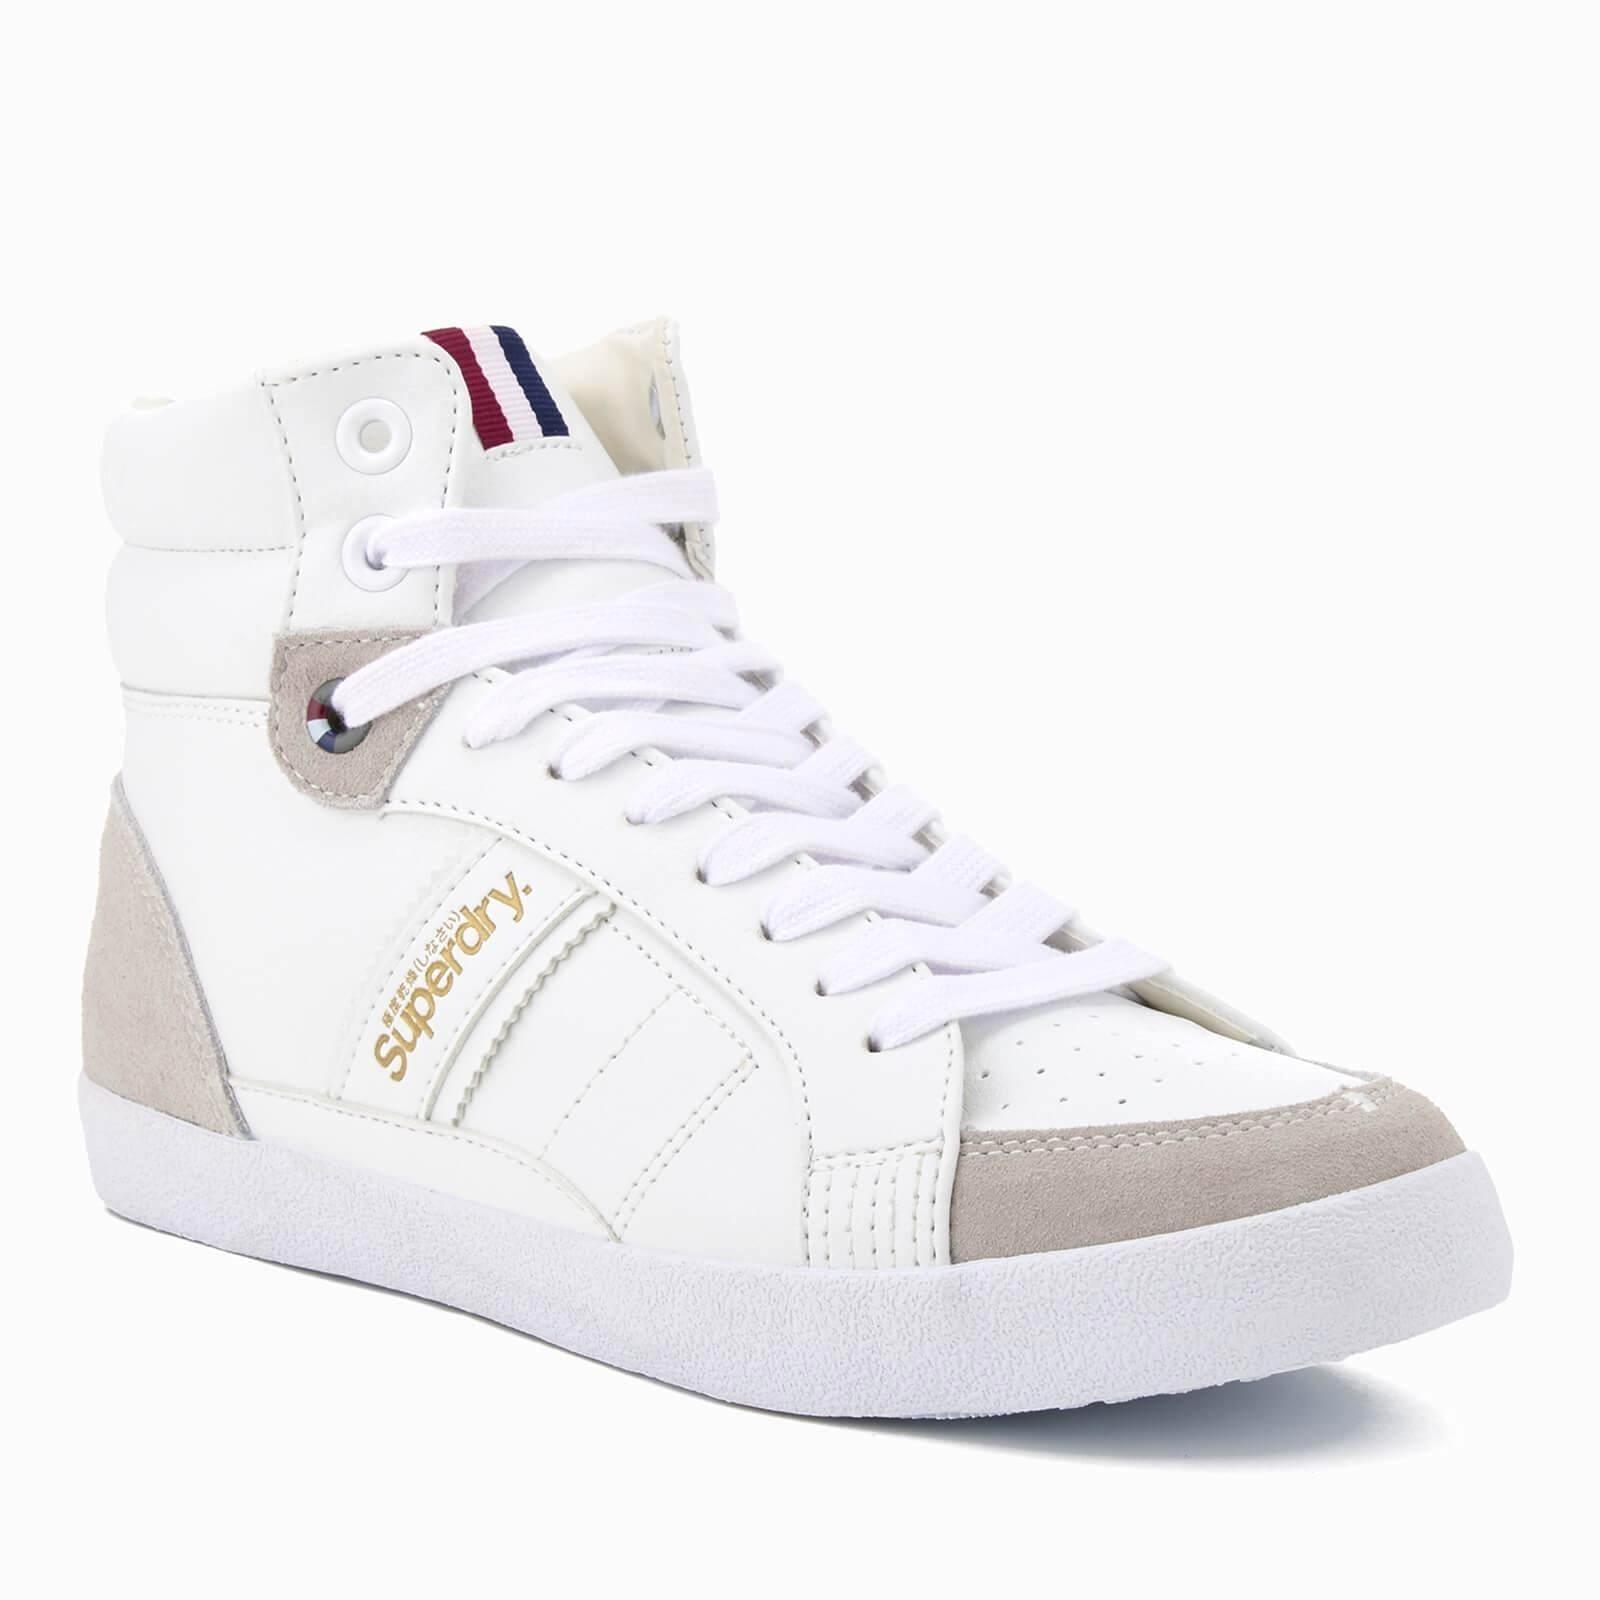 Superdry White Super Sleek Hi top Trainers